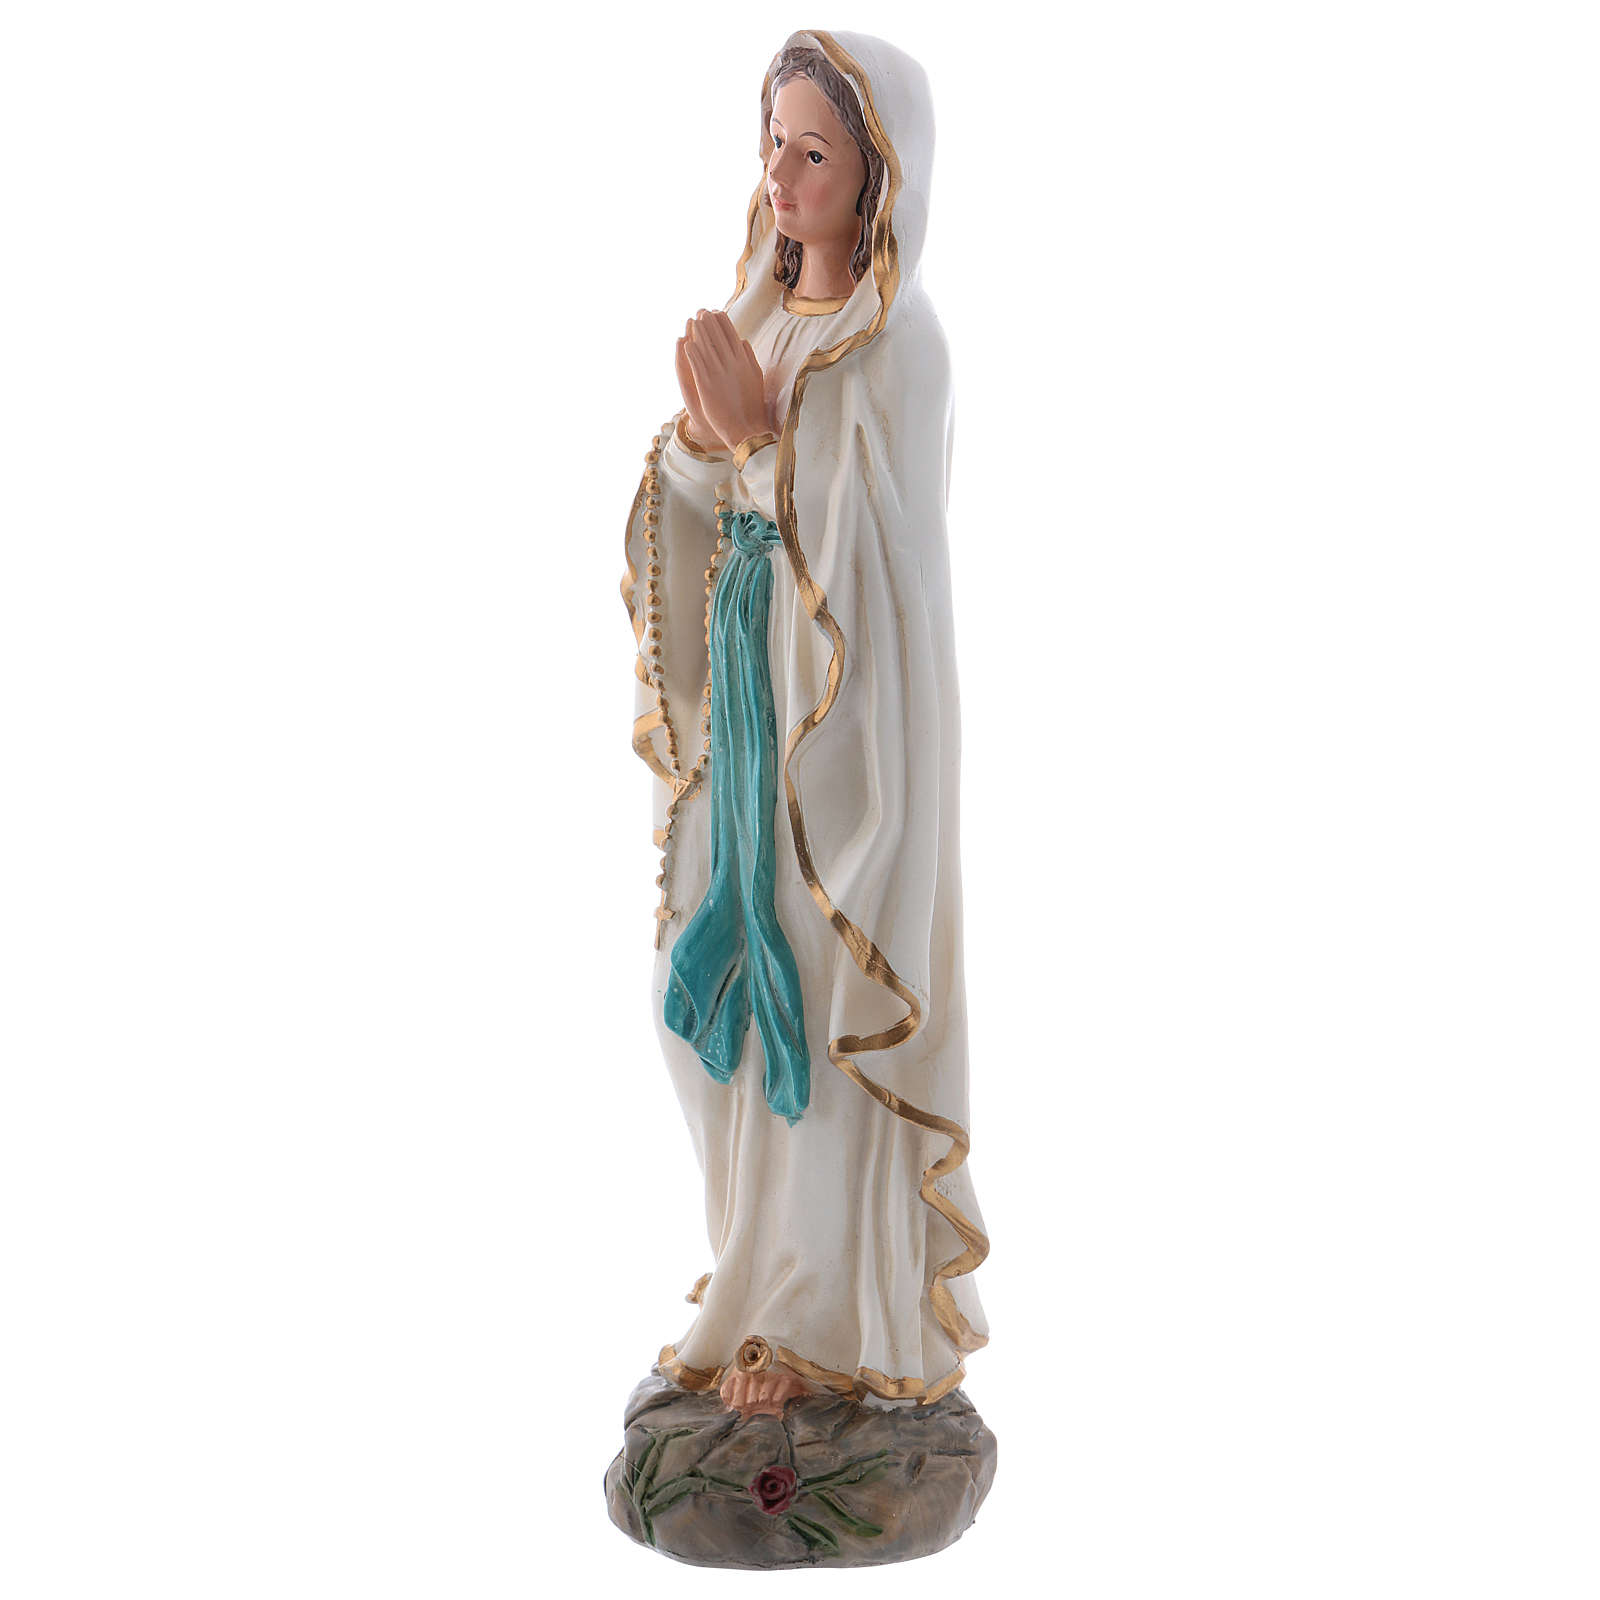 Lourdes Virgin Mary 20 cm Statue in resin 4